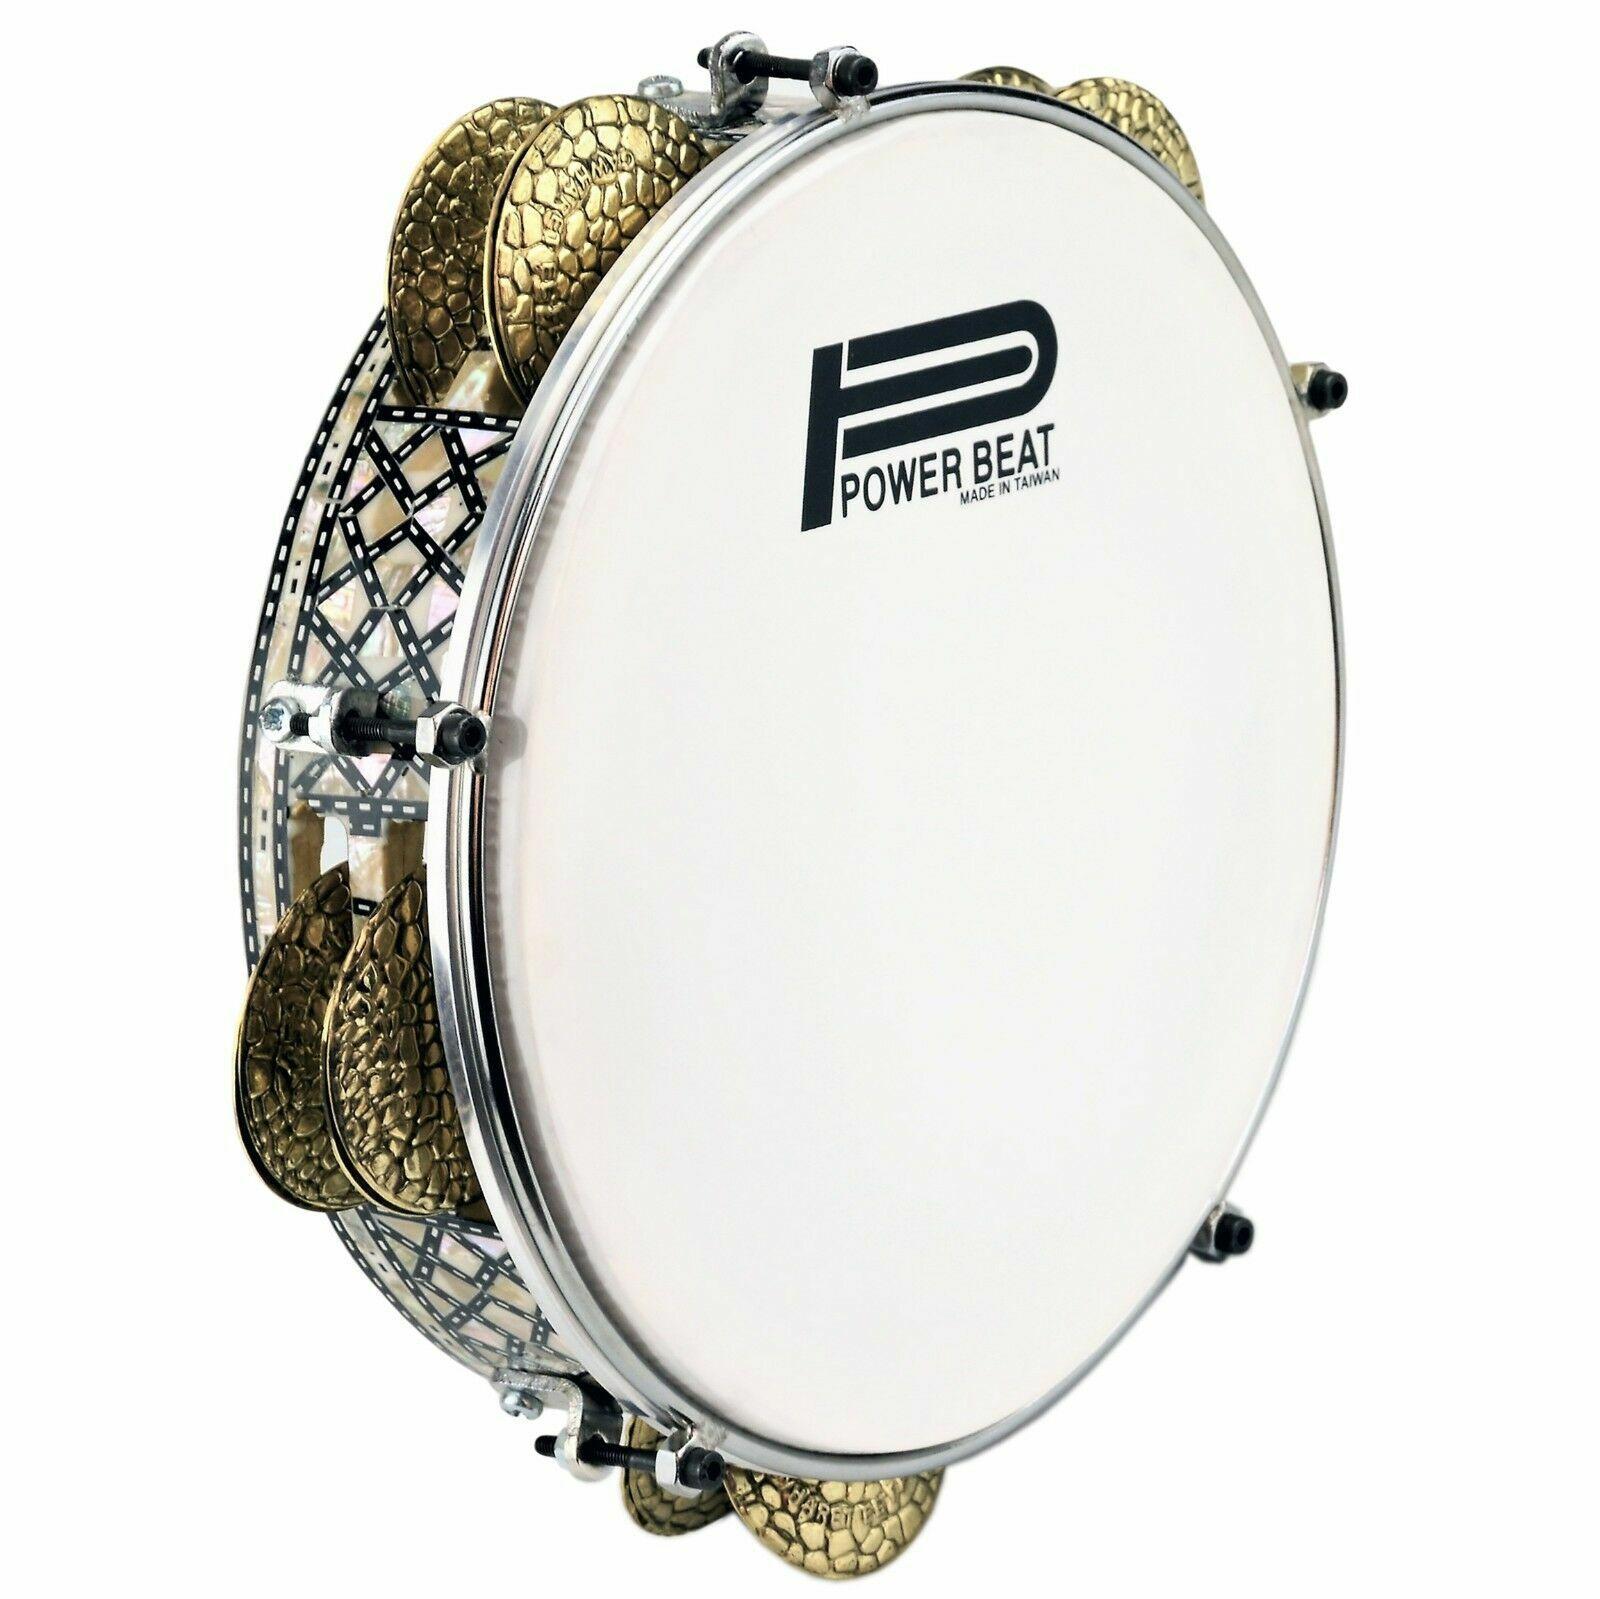 Ägyptische Professionell Pearl Req , Riq Trommel, Darbuka Gawharet El Fan 26.7cm